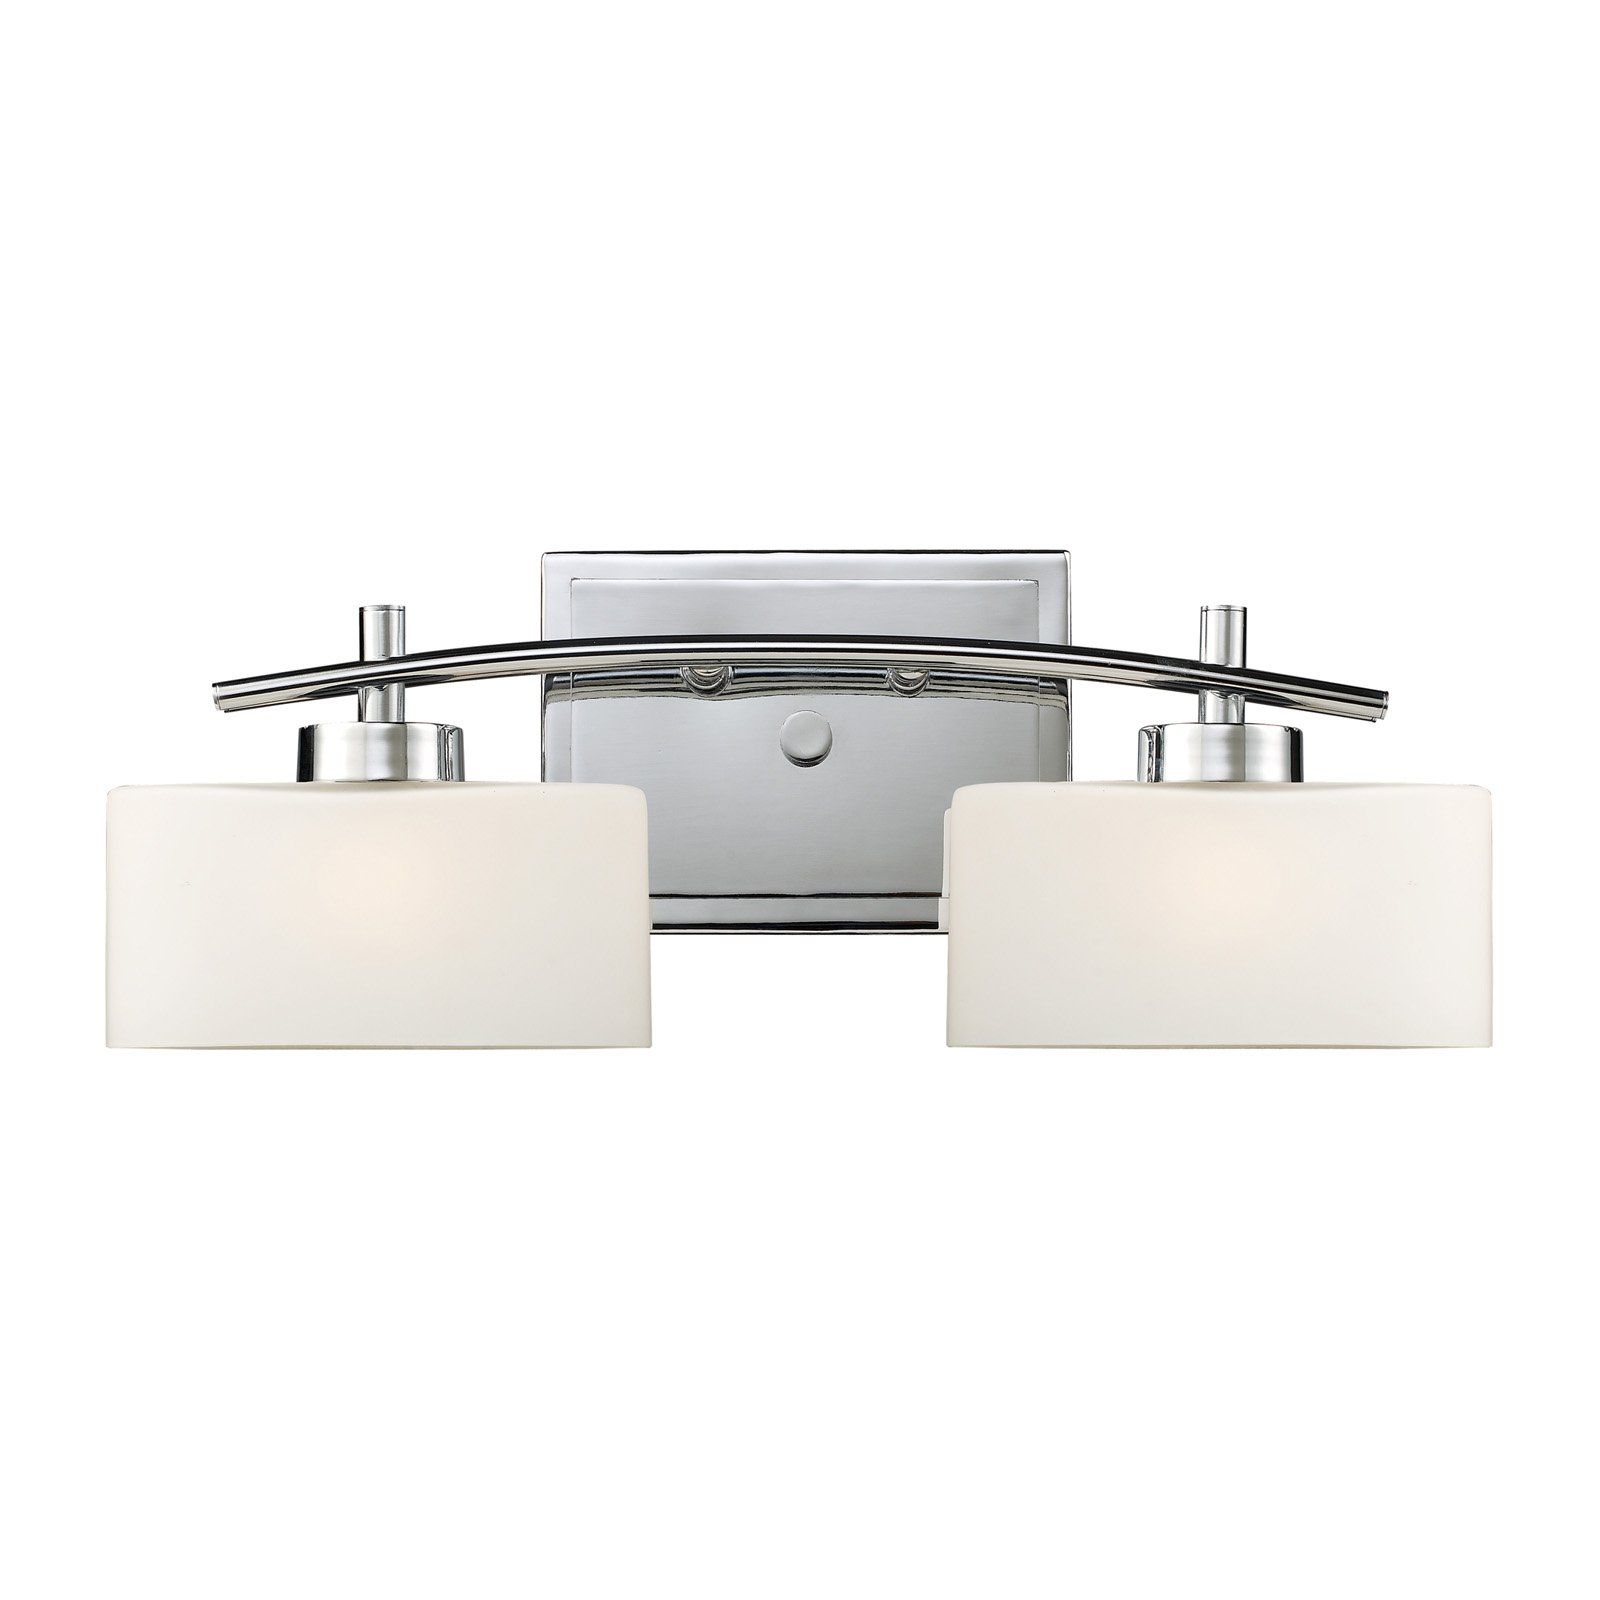 . ELK Lighting Eastbrook 2-Light Bathroom Vanity Light 17081/2 - 18W in. $166.00